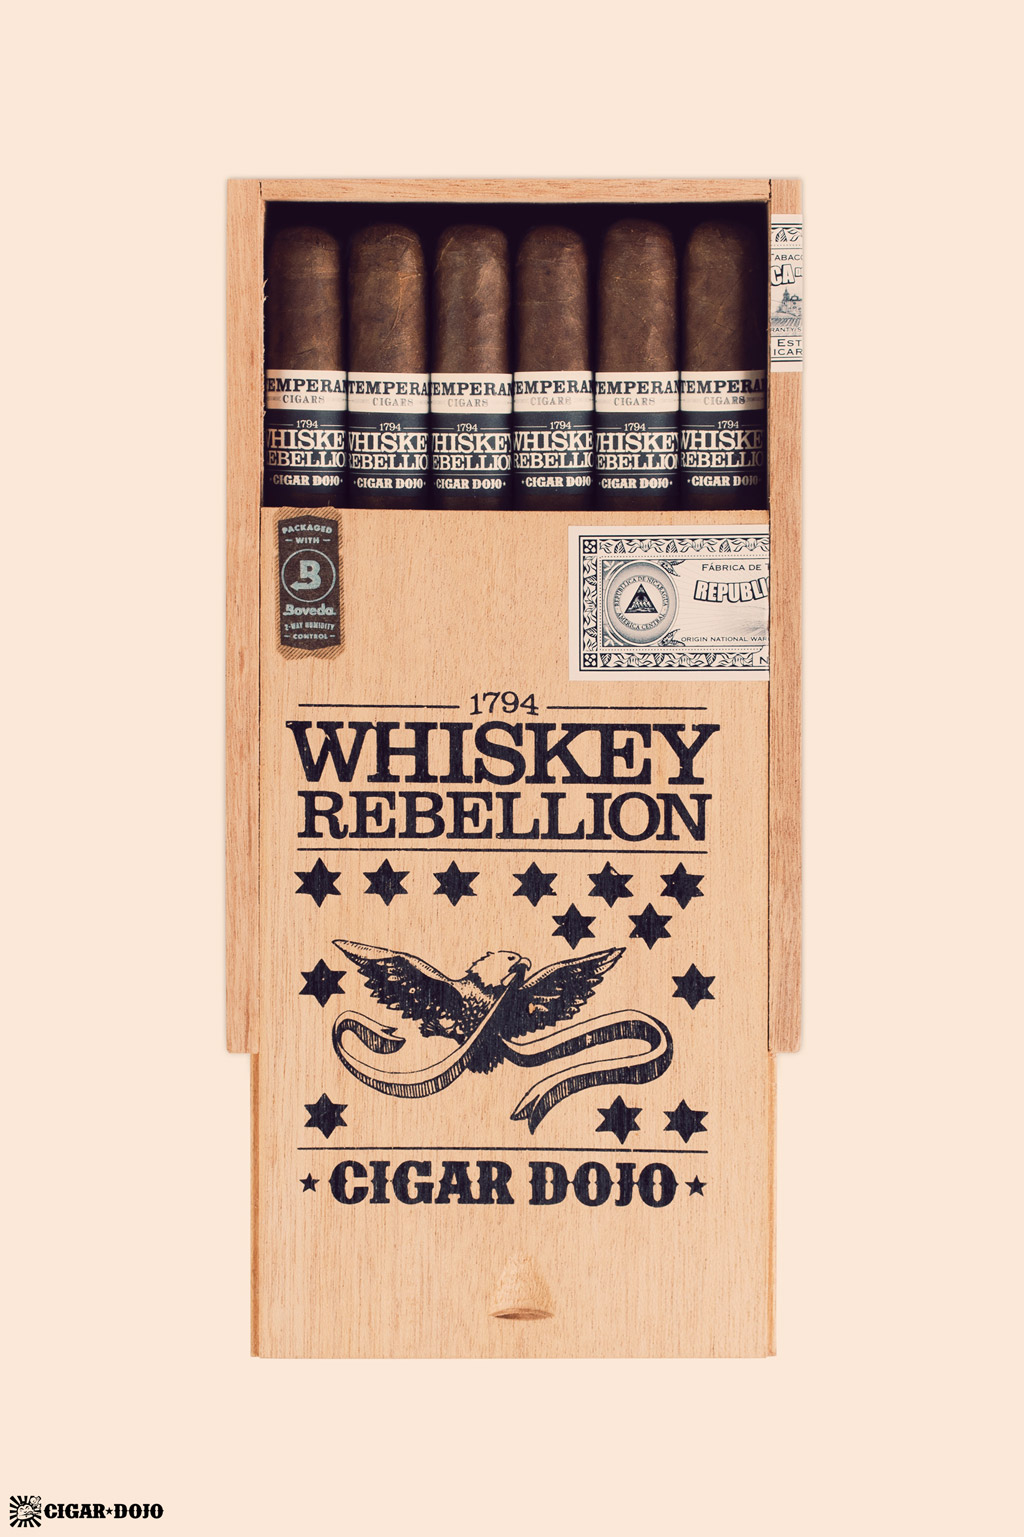 RoMa Craft Whiskey Rebellion 1794 Pennsatucky cigar box glamour